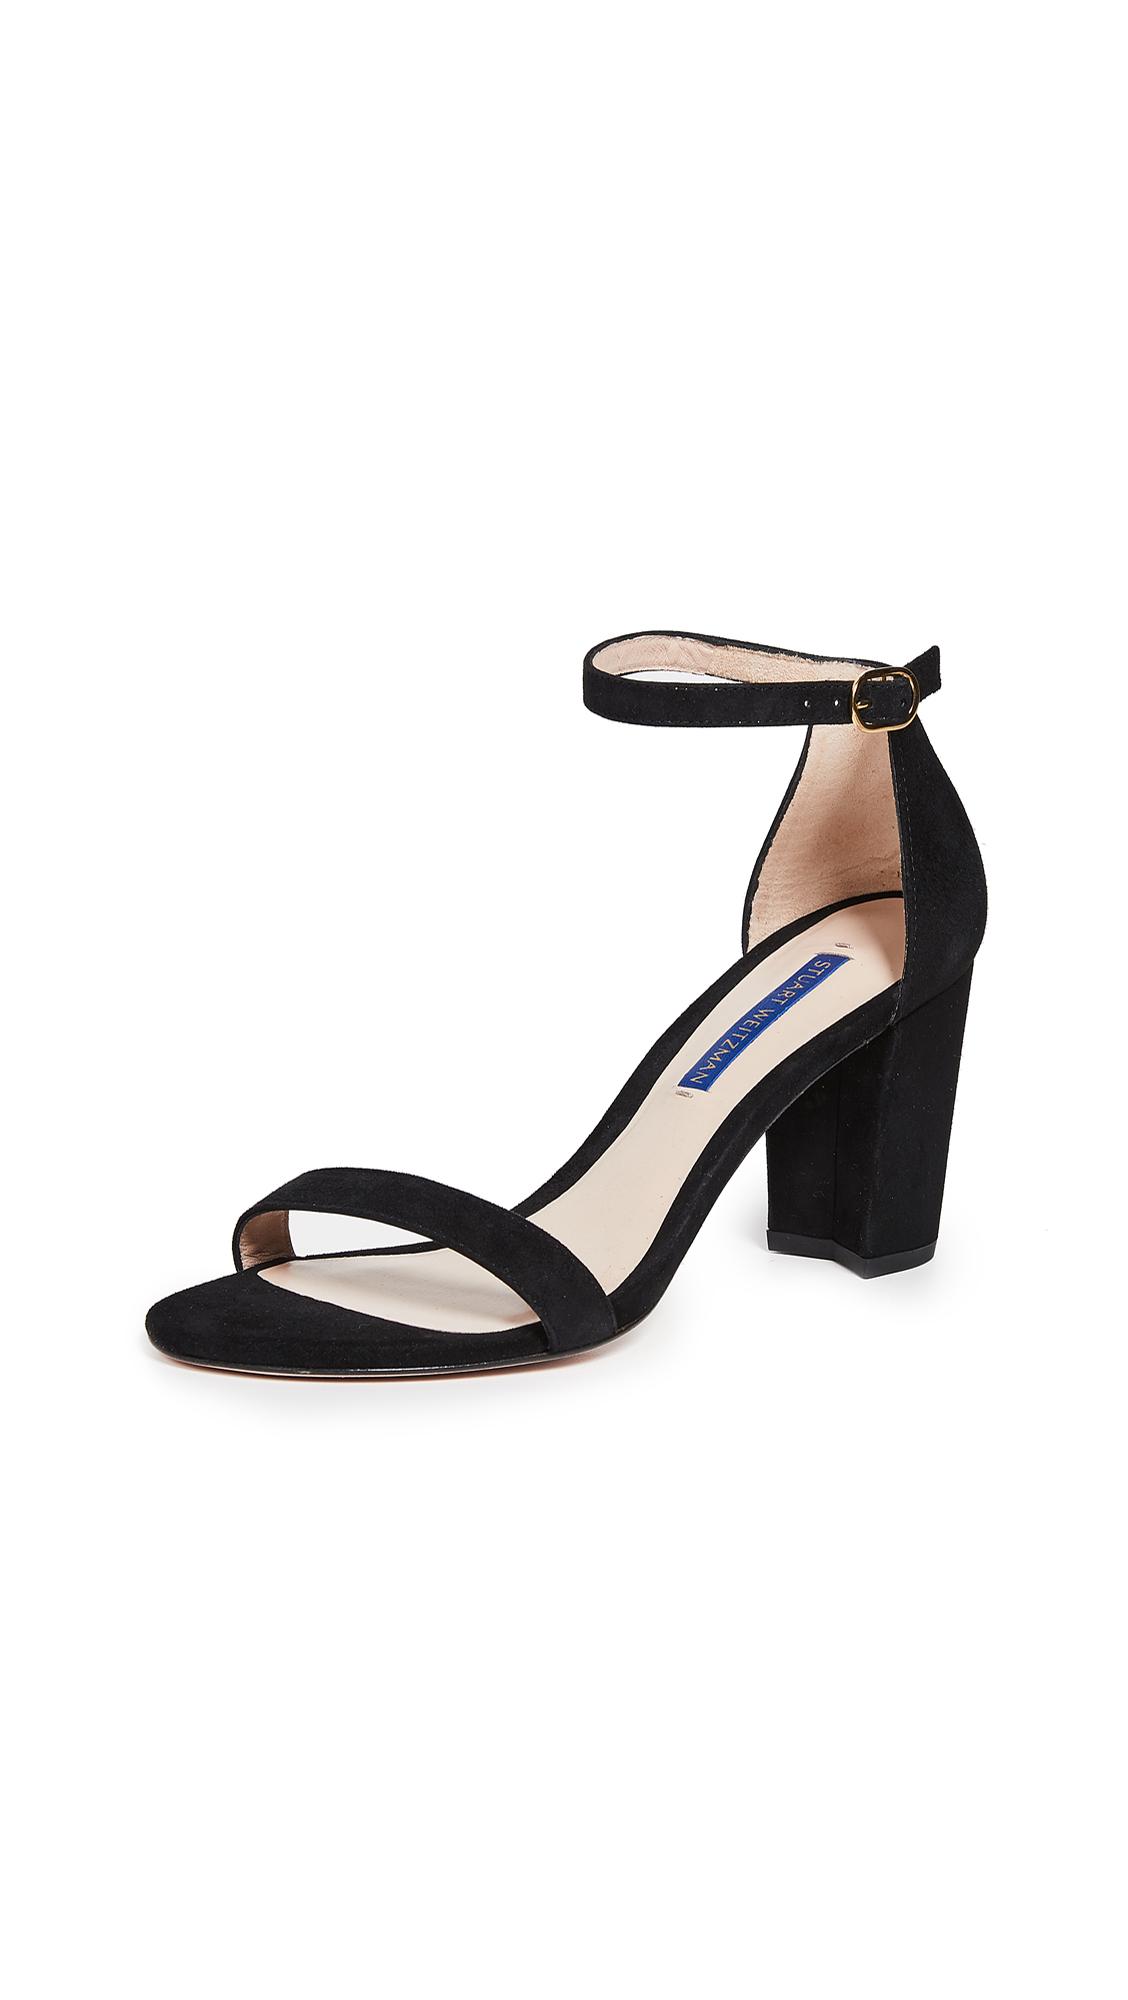 Stuart Weitzman Nearlynude Sandals - Black